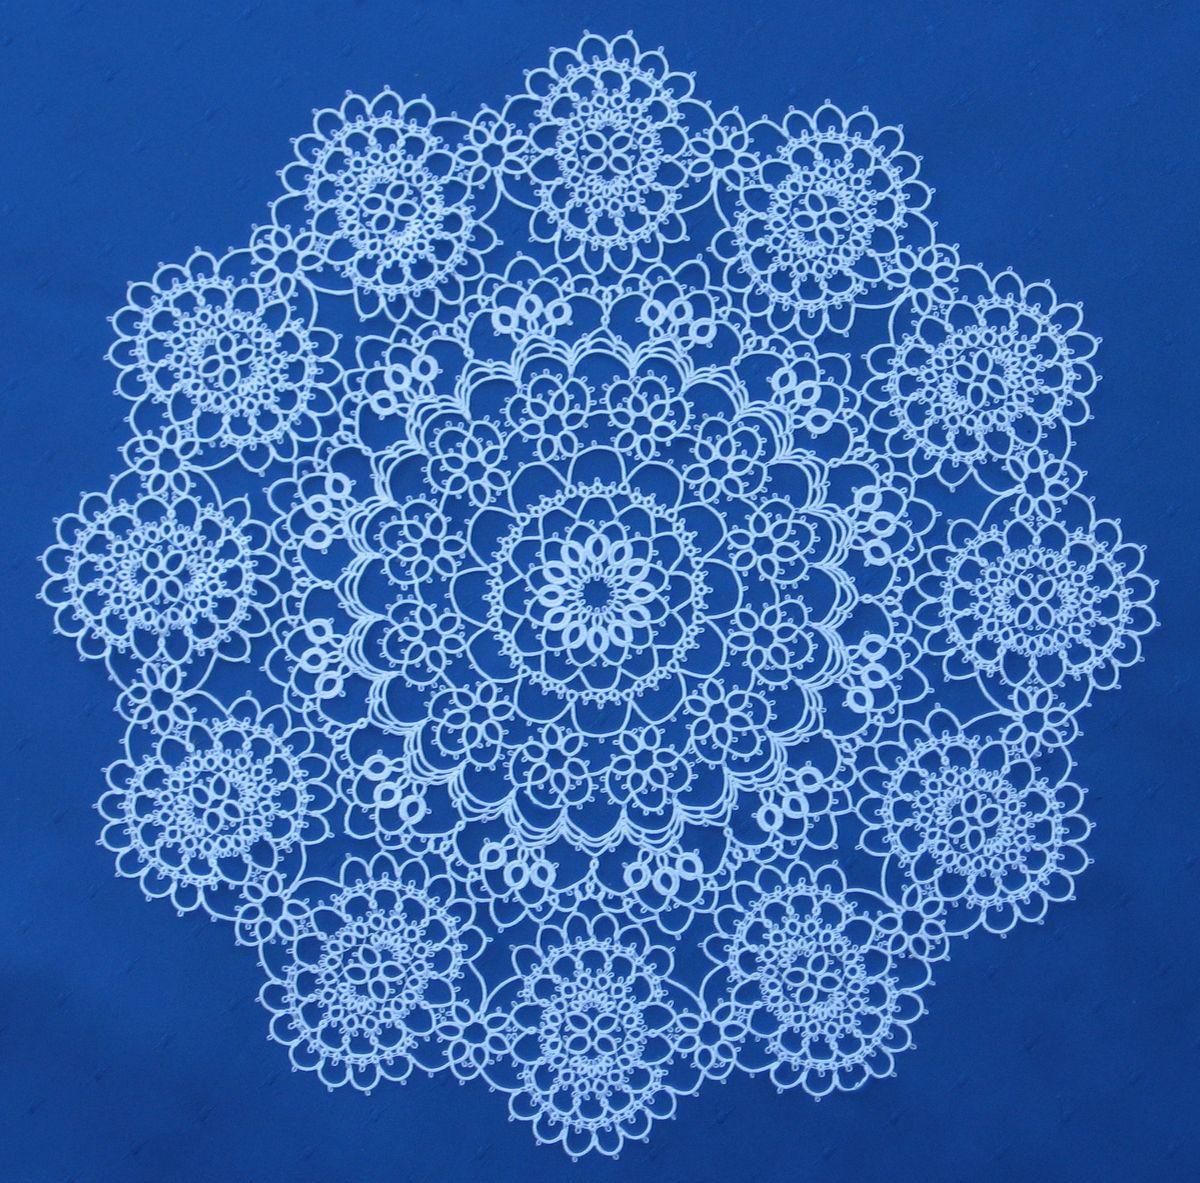 39302c071a2f7121c91bb40230aceb01.jpg 1,200×1,183ピクセル